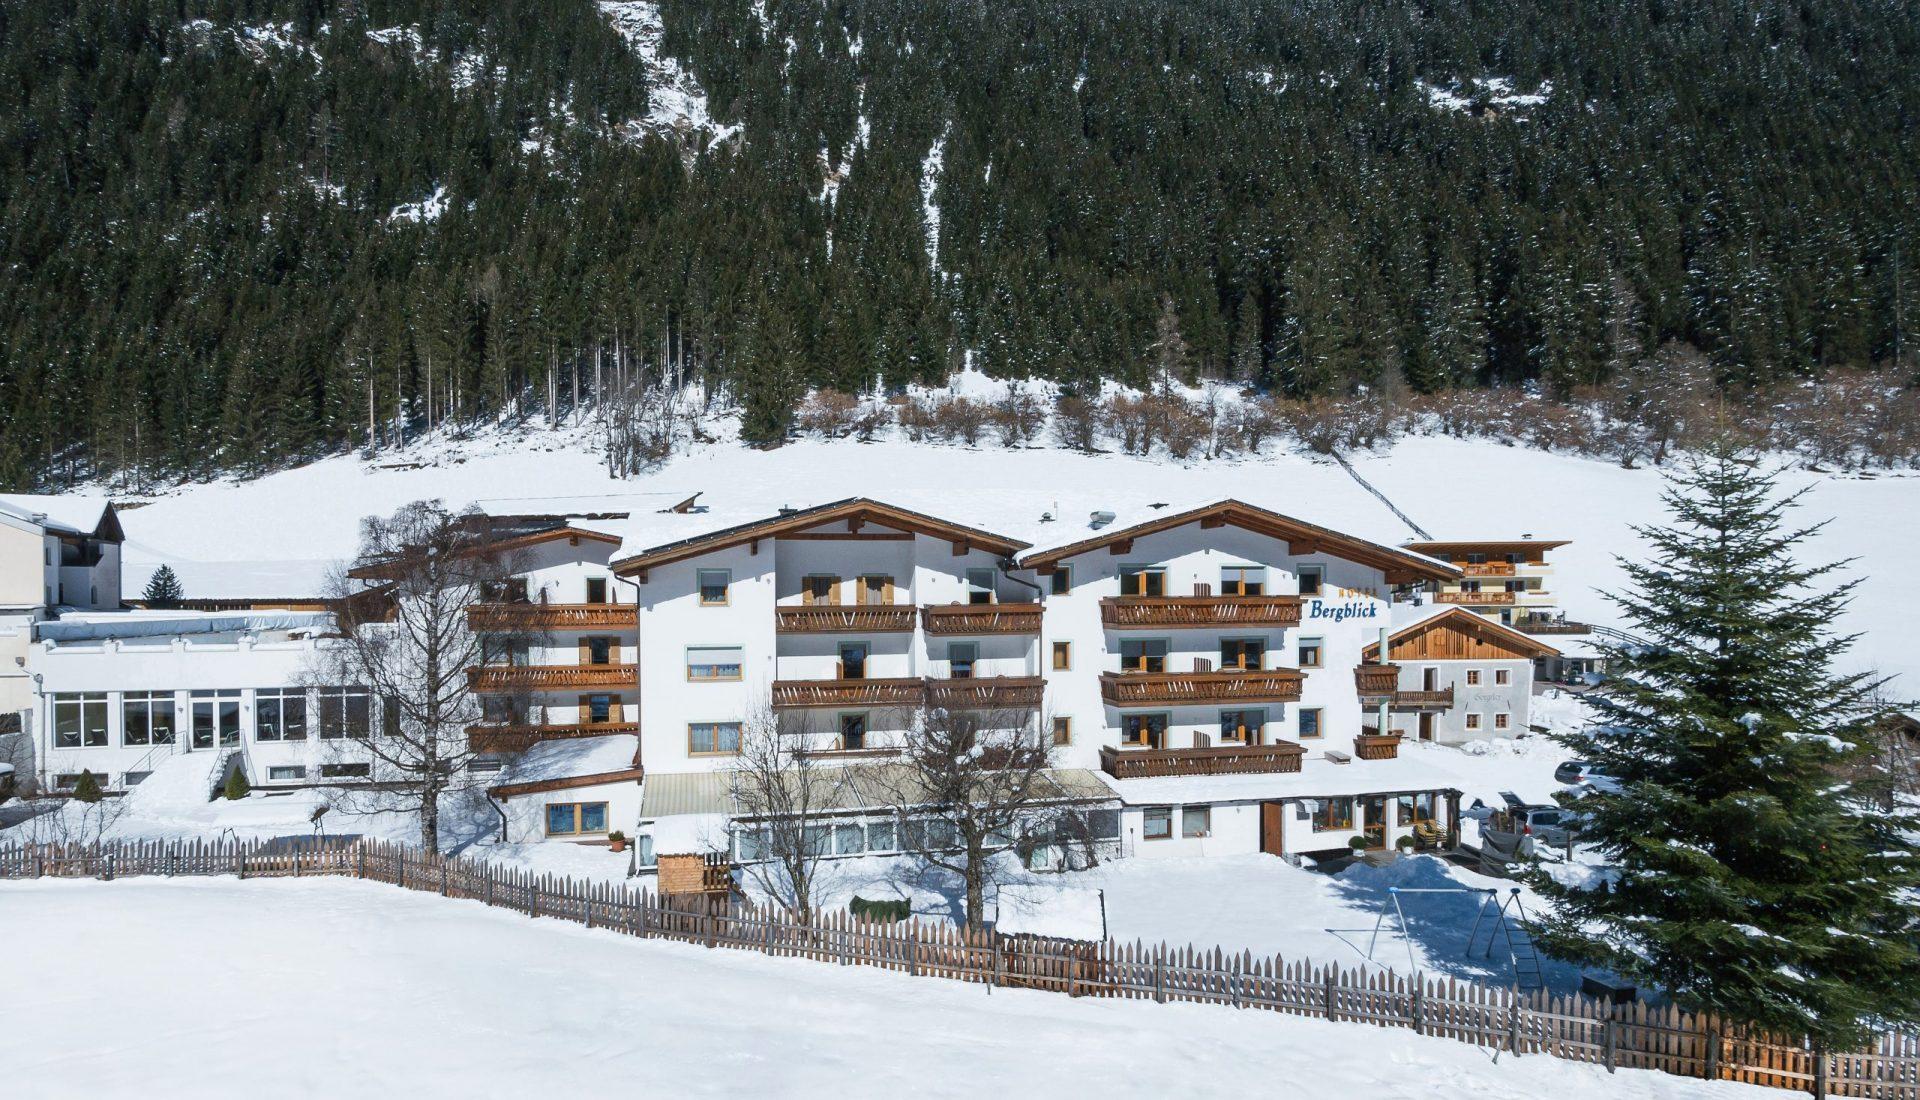 Hotel Bergblick im Schnee